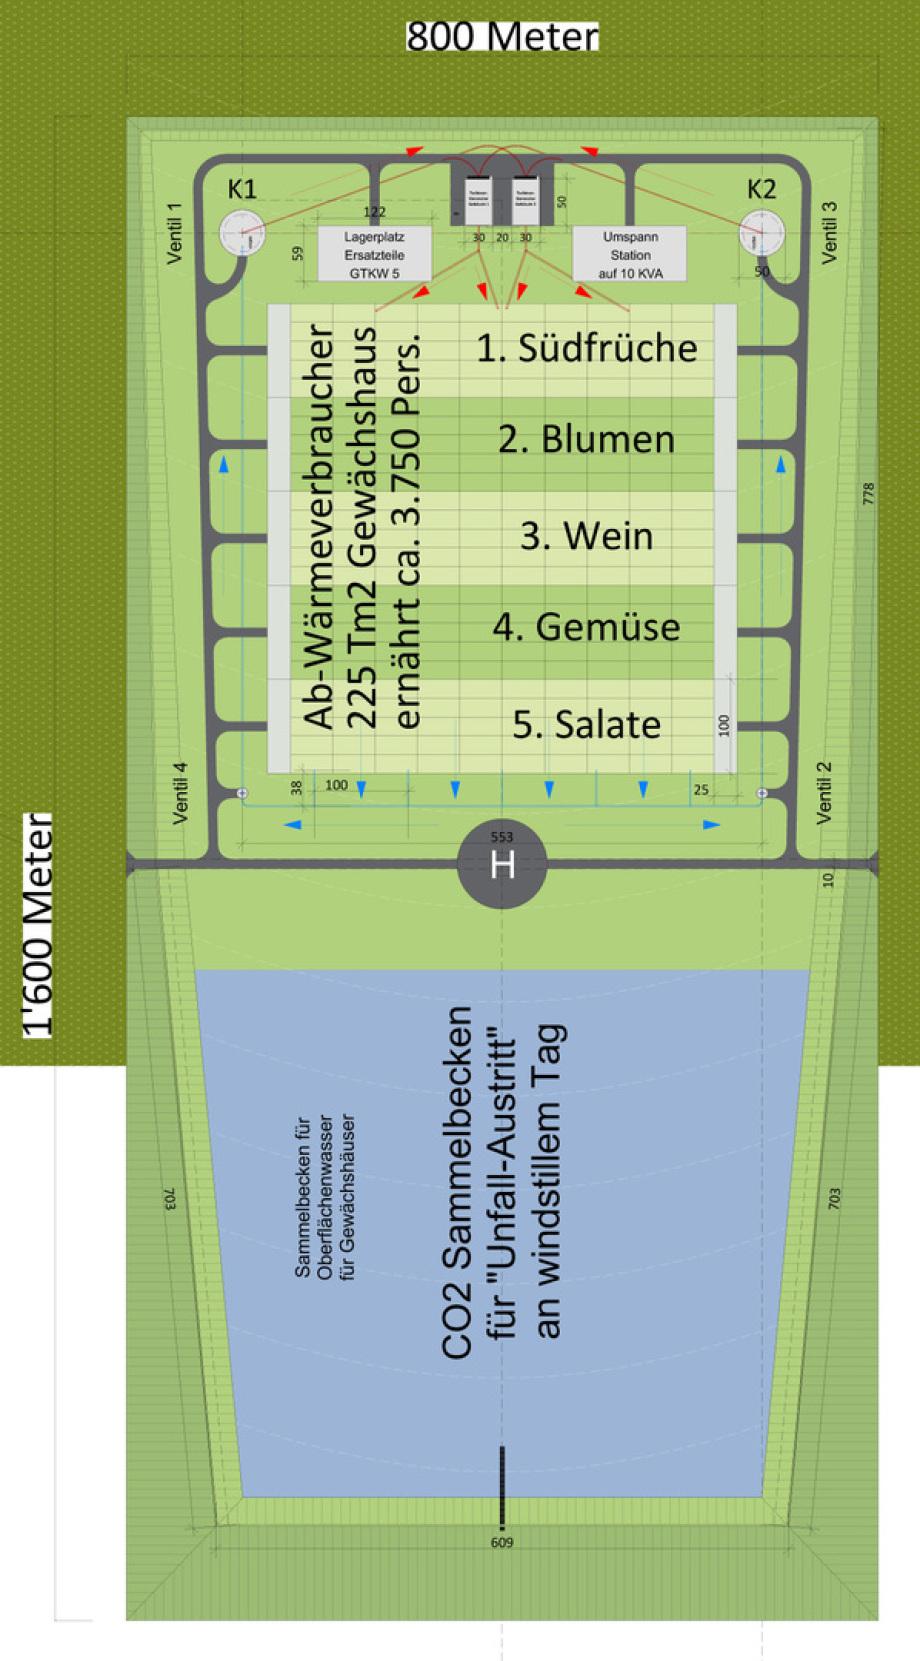 Endlager Atommüll Kuehlkasten_Sammelbecken_Turbinen_Gebaeude_Endlager_GTKW_5.3_suedlich_Kroepelin_M-V_BRD_Ing_Goebel